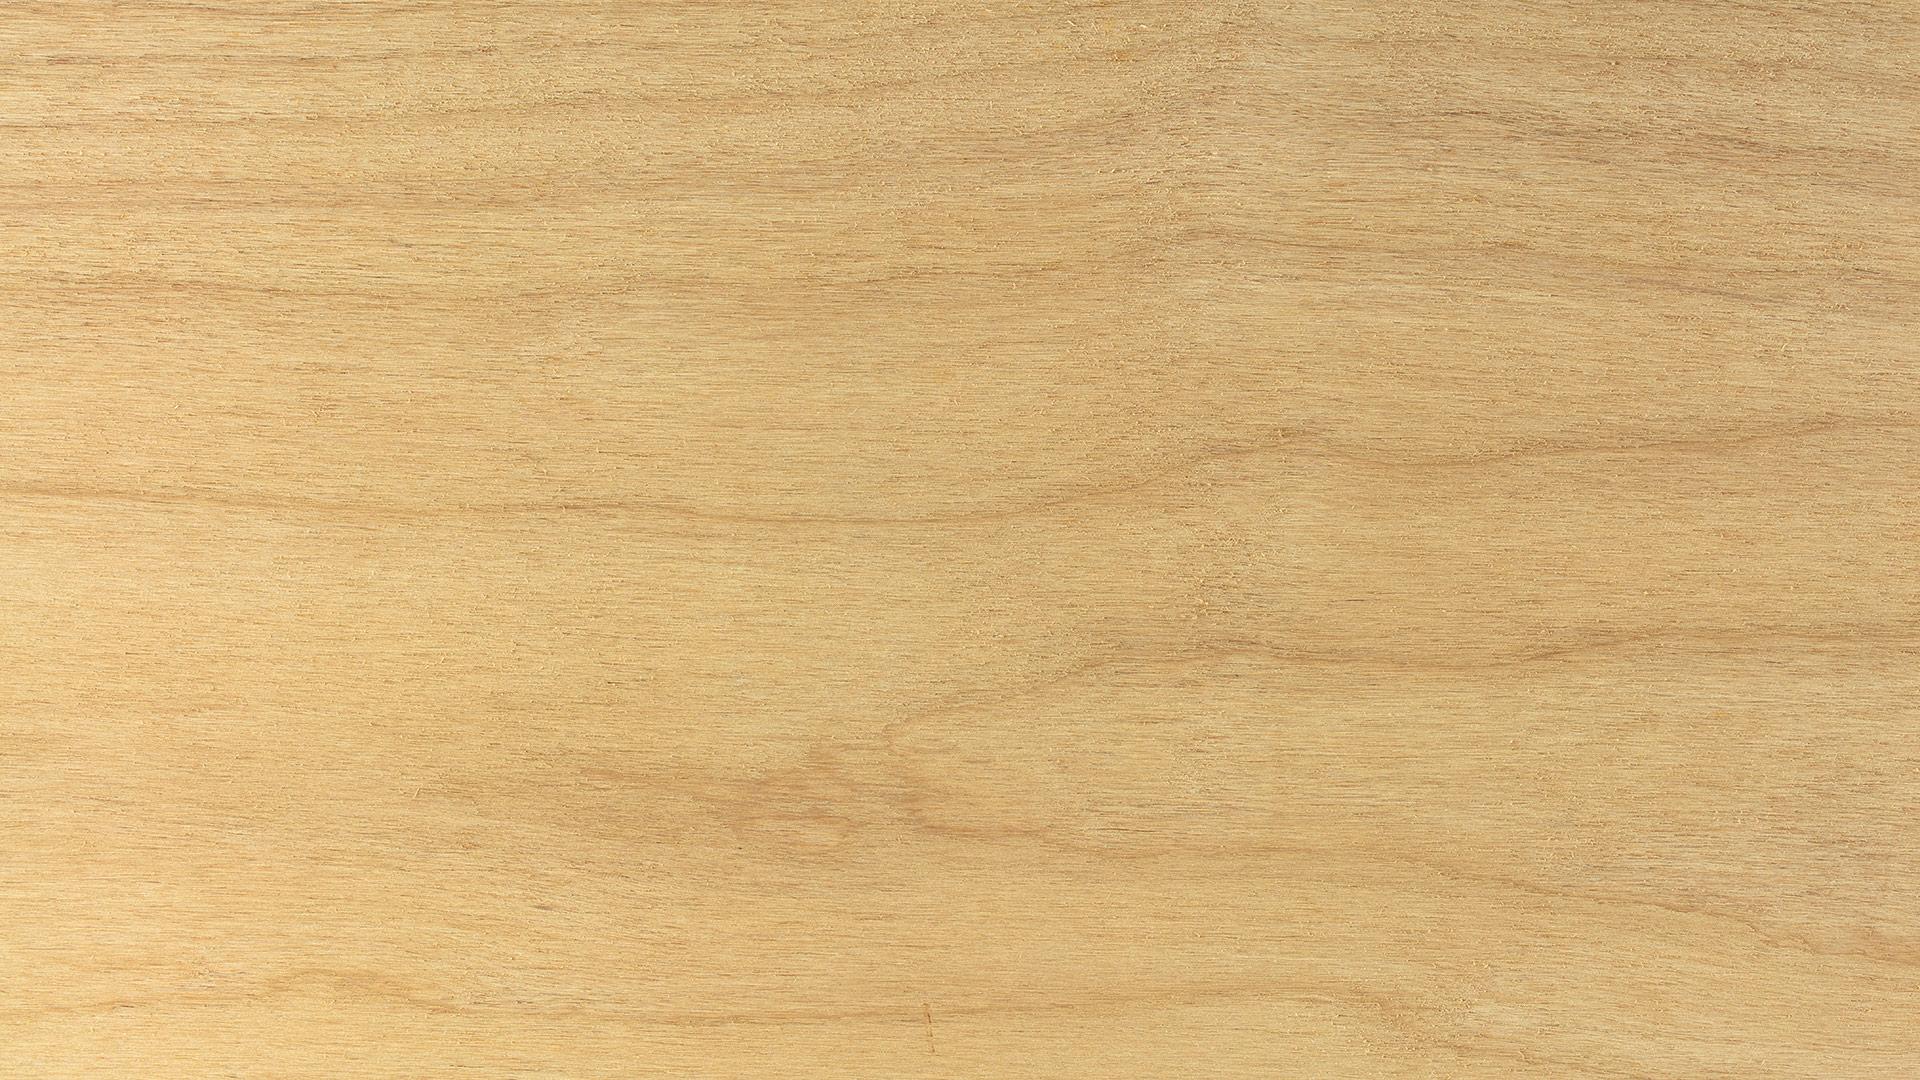 Alder grain 1920x1080